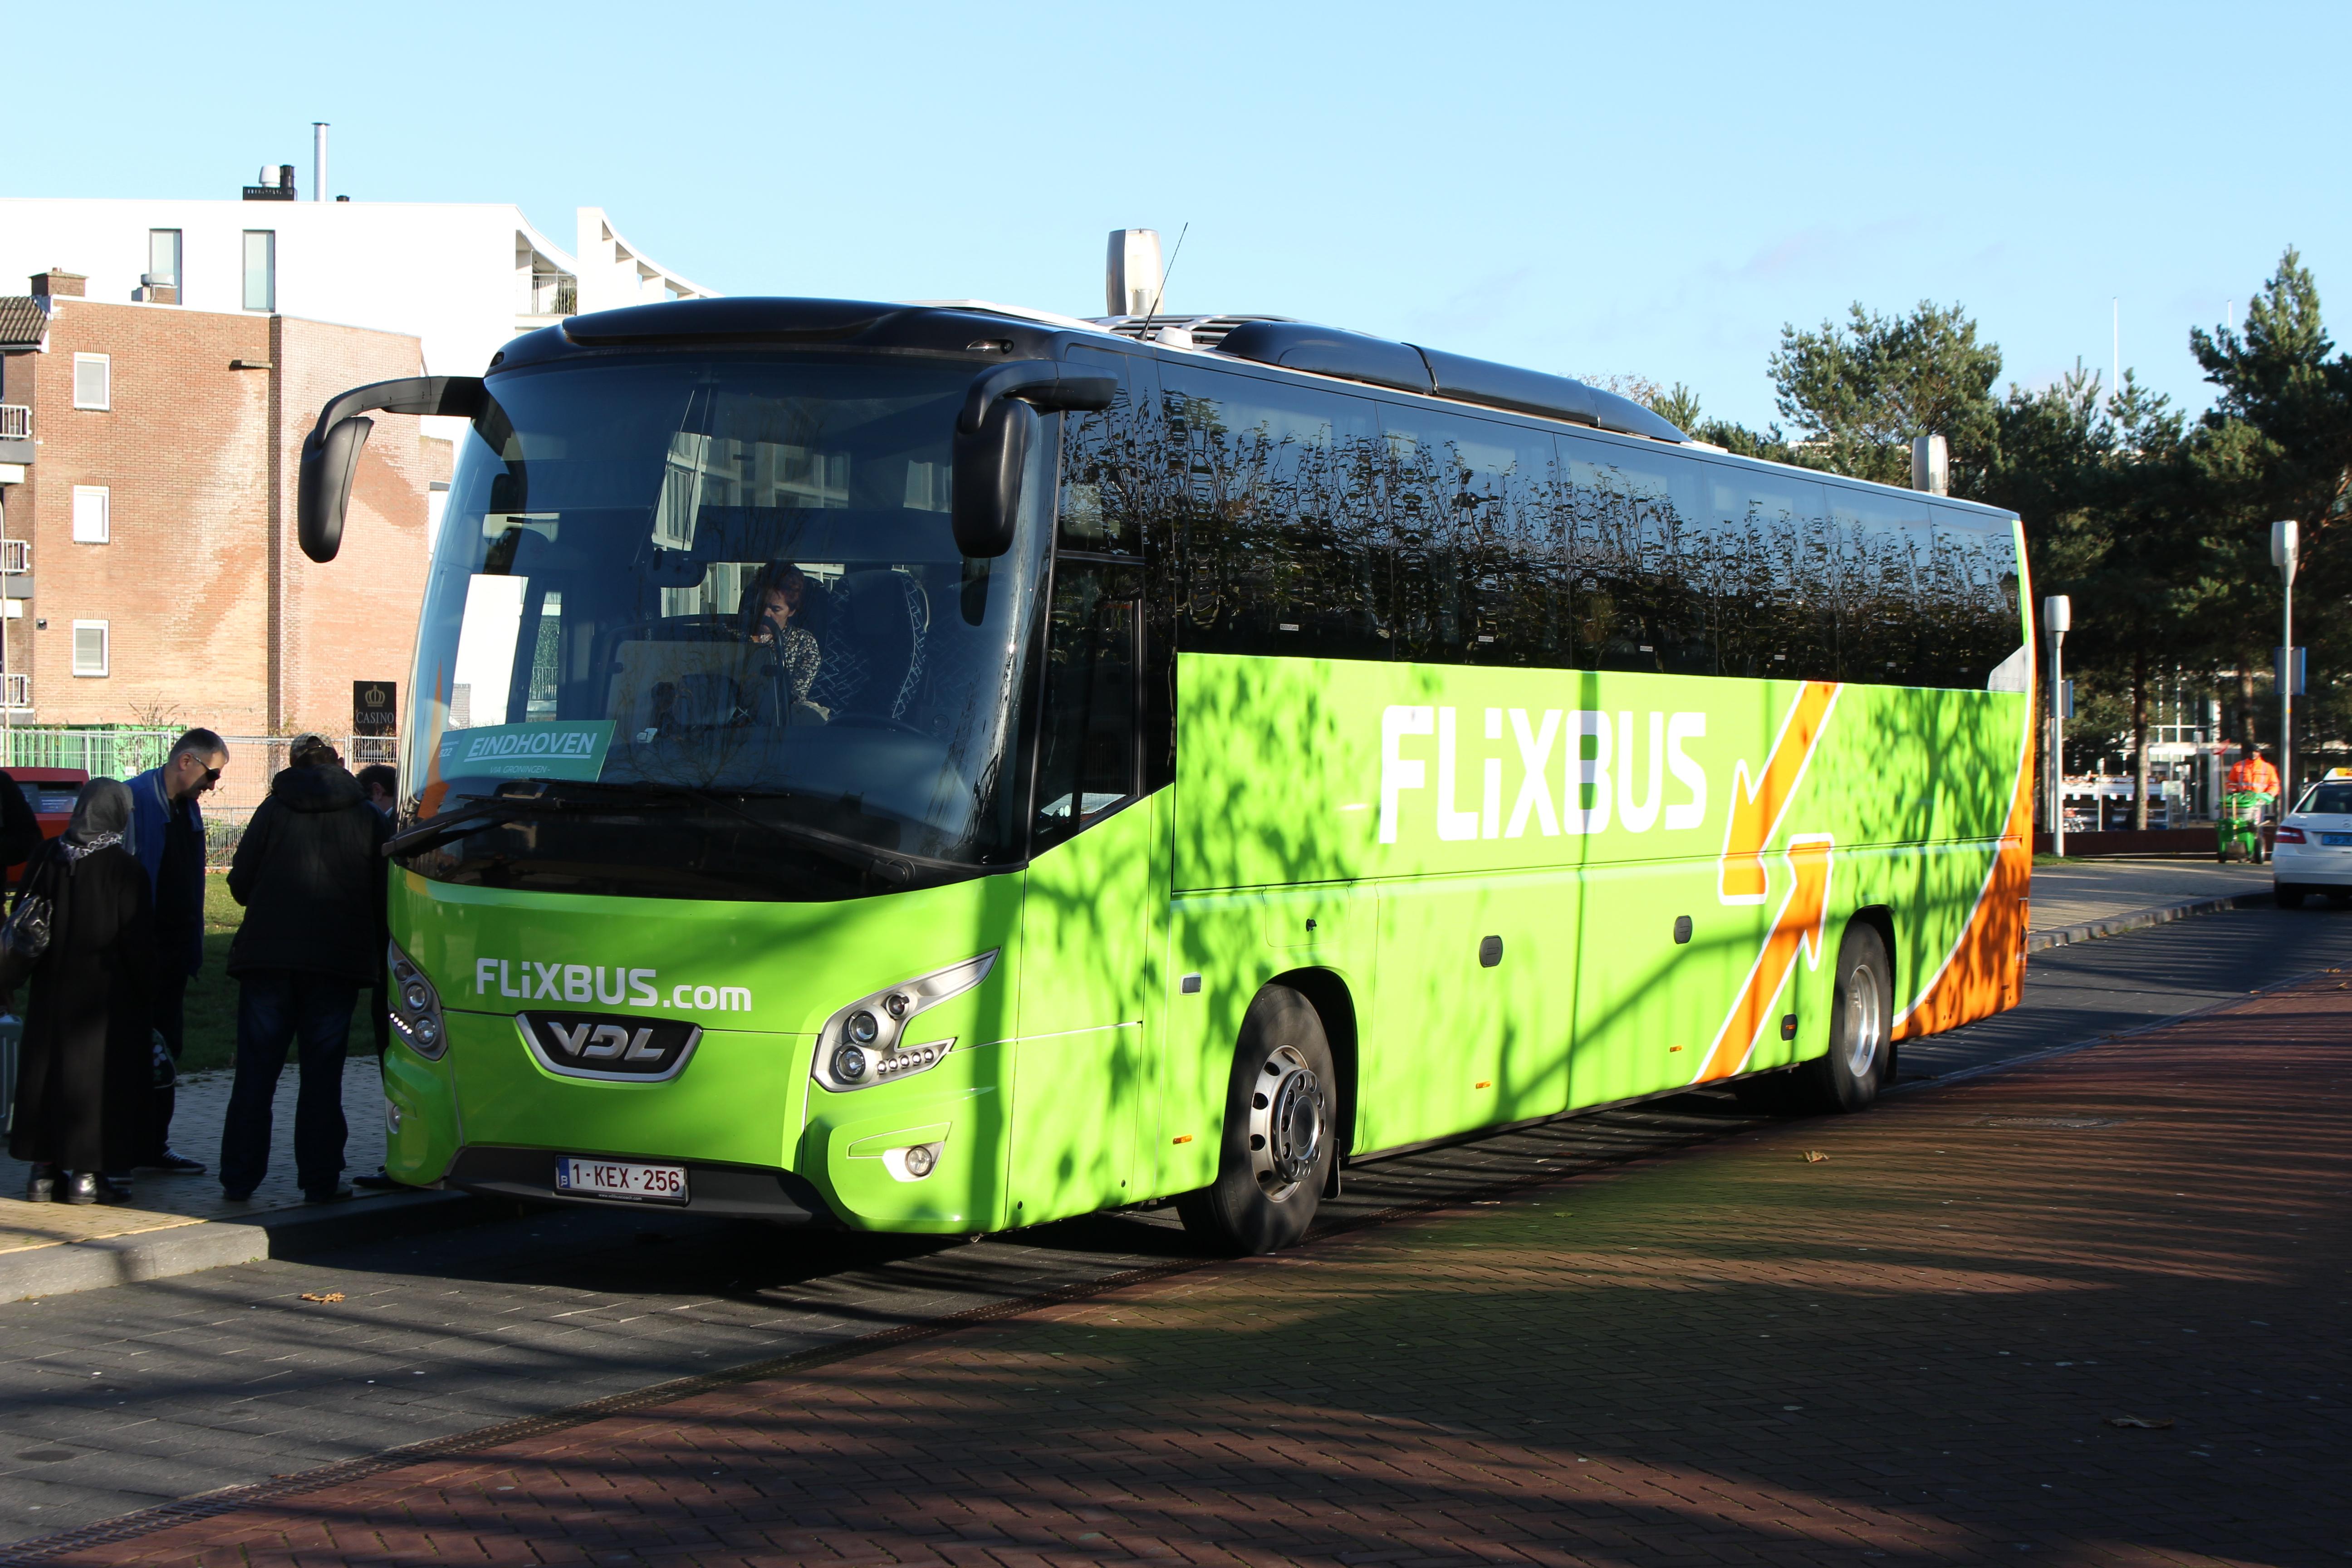 flixbus feedback